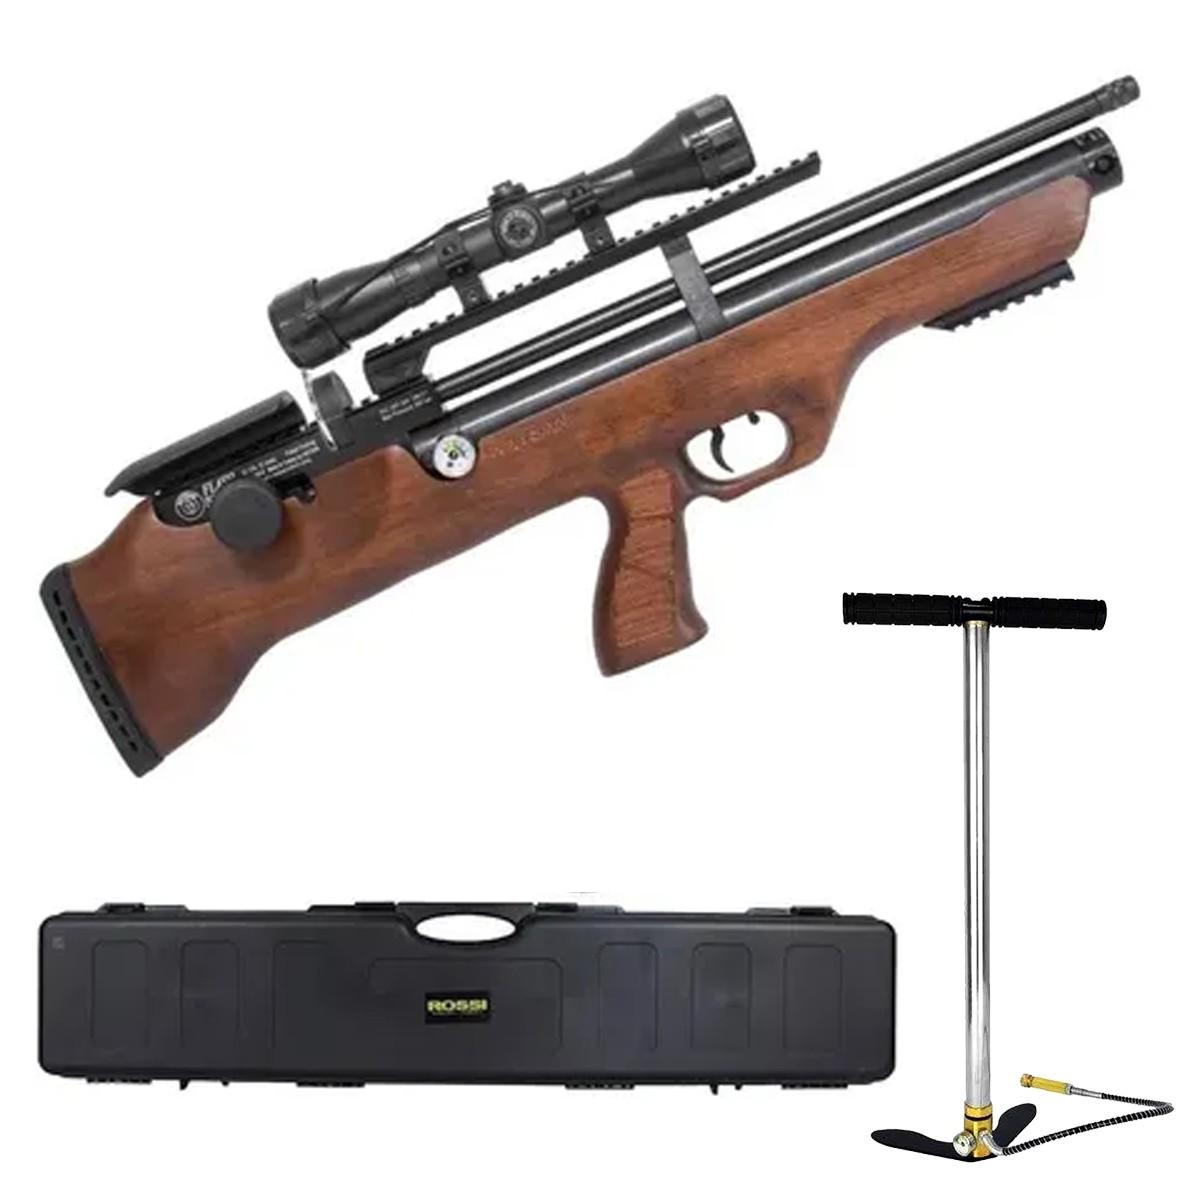 Carabina De Pressão PCP Hatsan Flashpup Wood 12 Tiros 5,5 + Luneta 4x32 + Bomba + Case